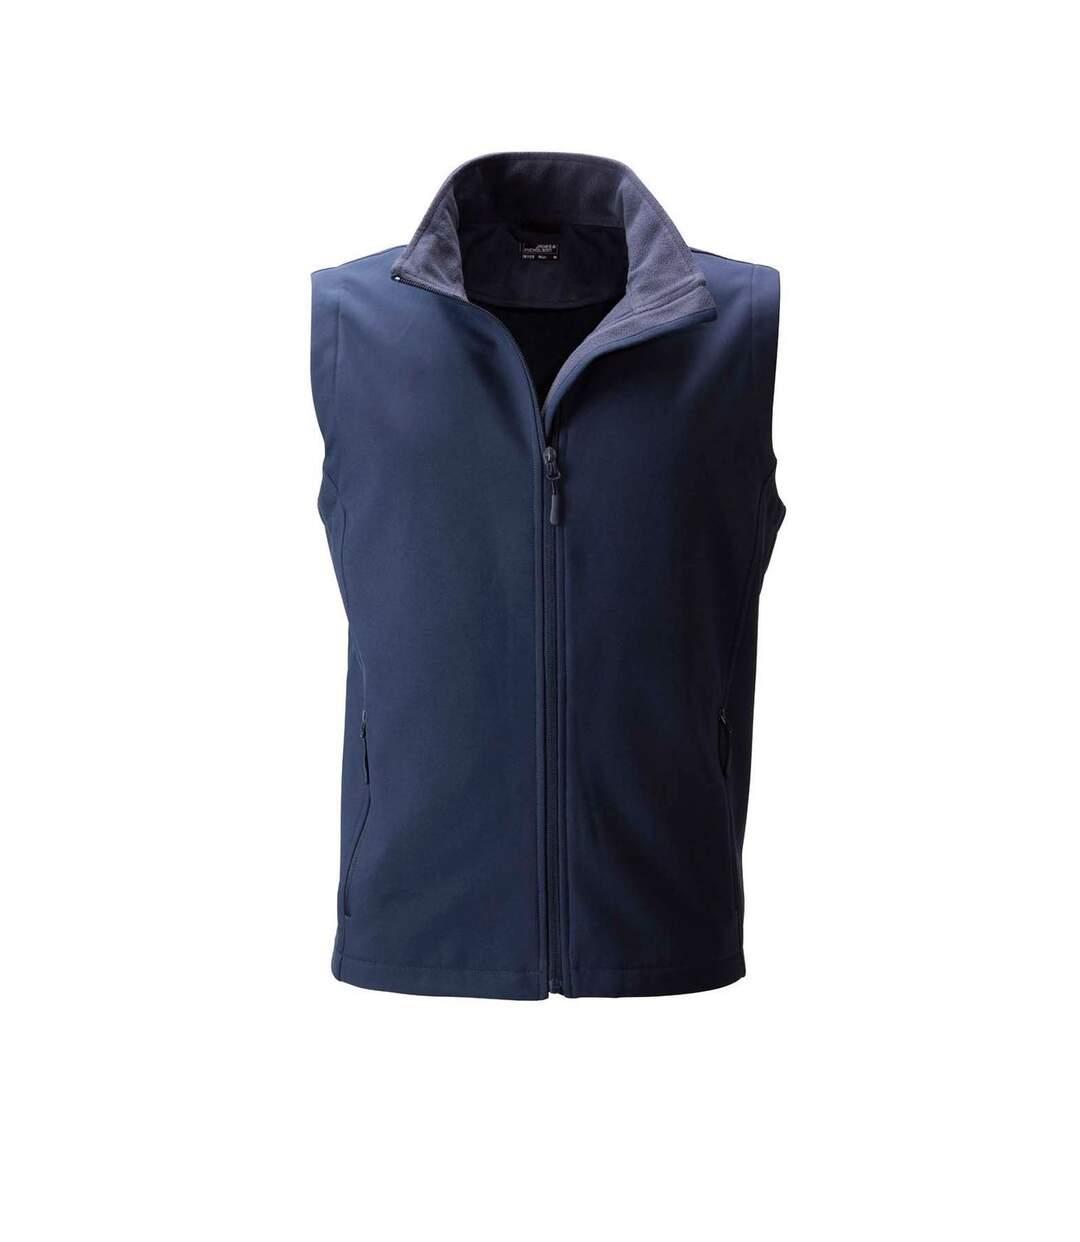 Gilet sans manches micropolaire softshell - JN1128 - bleu marine - Homme